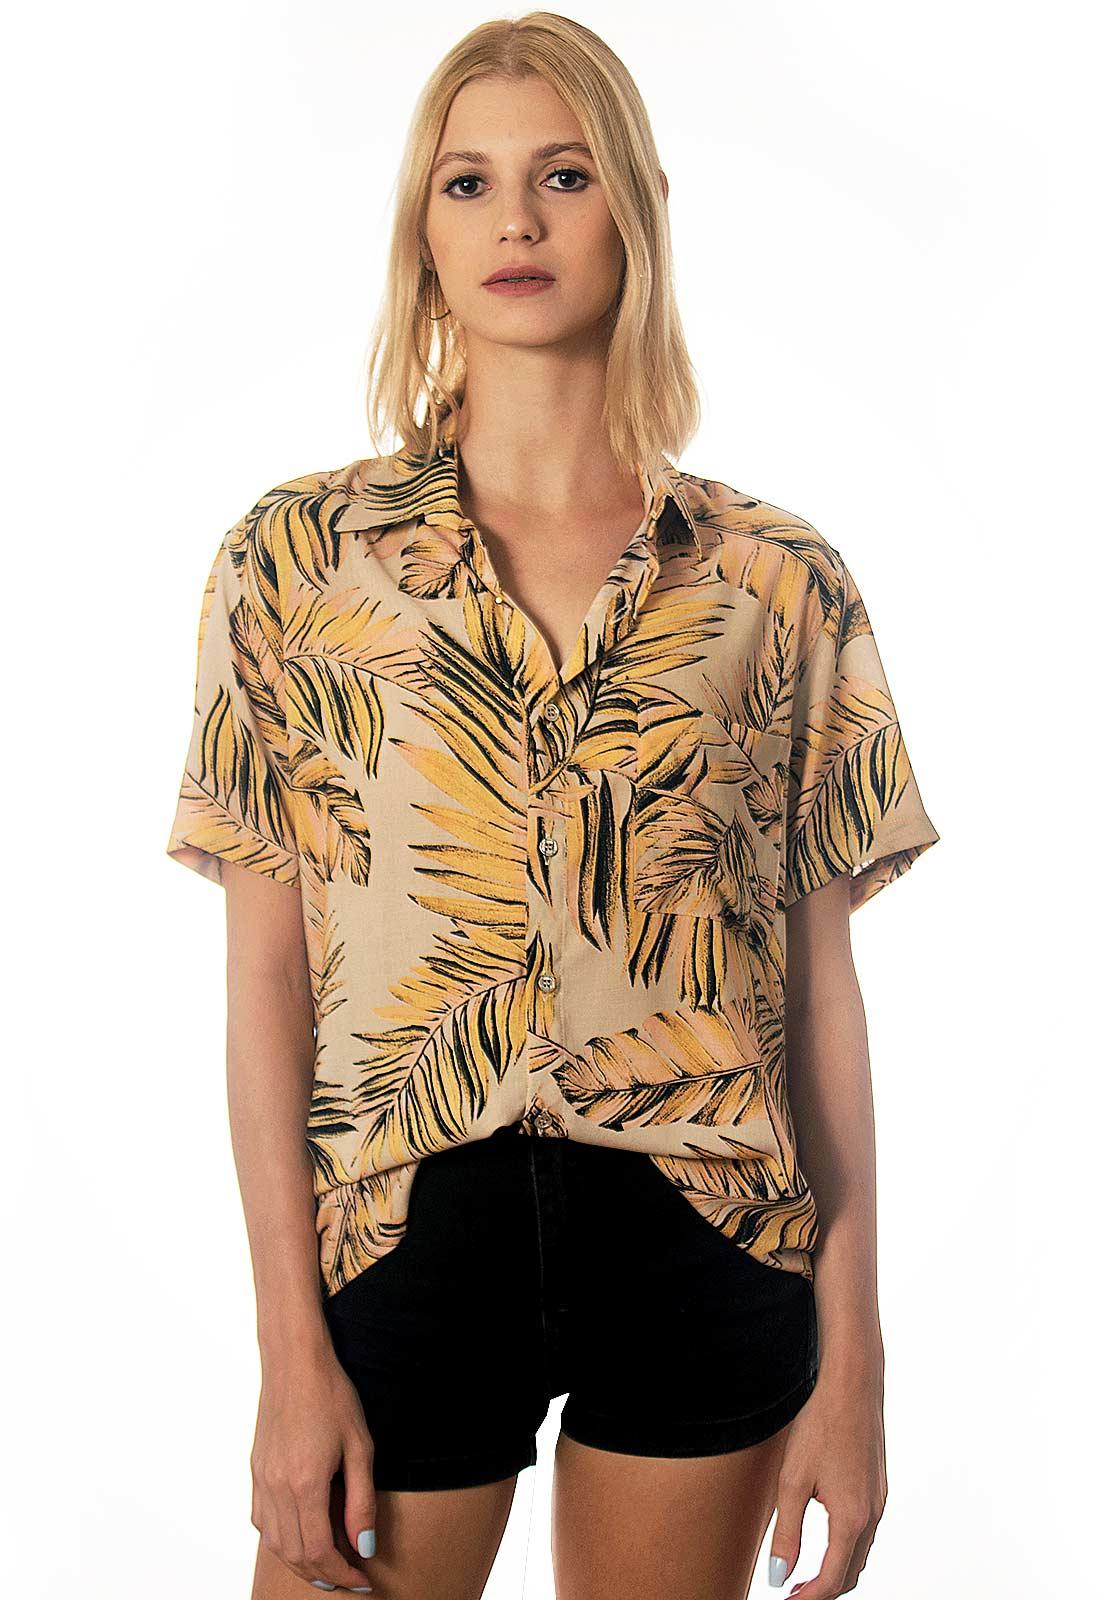 Camisa Folhagens Estampada Floral ElephunK Itacaré Creme